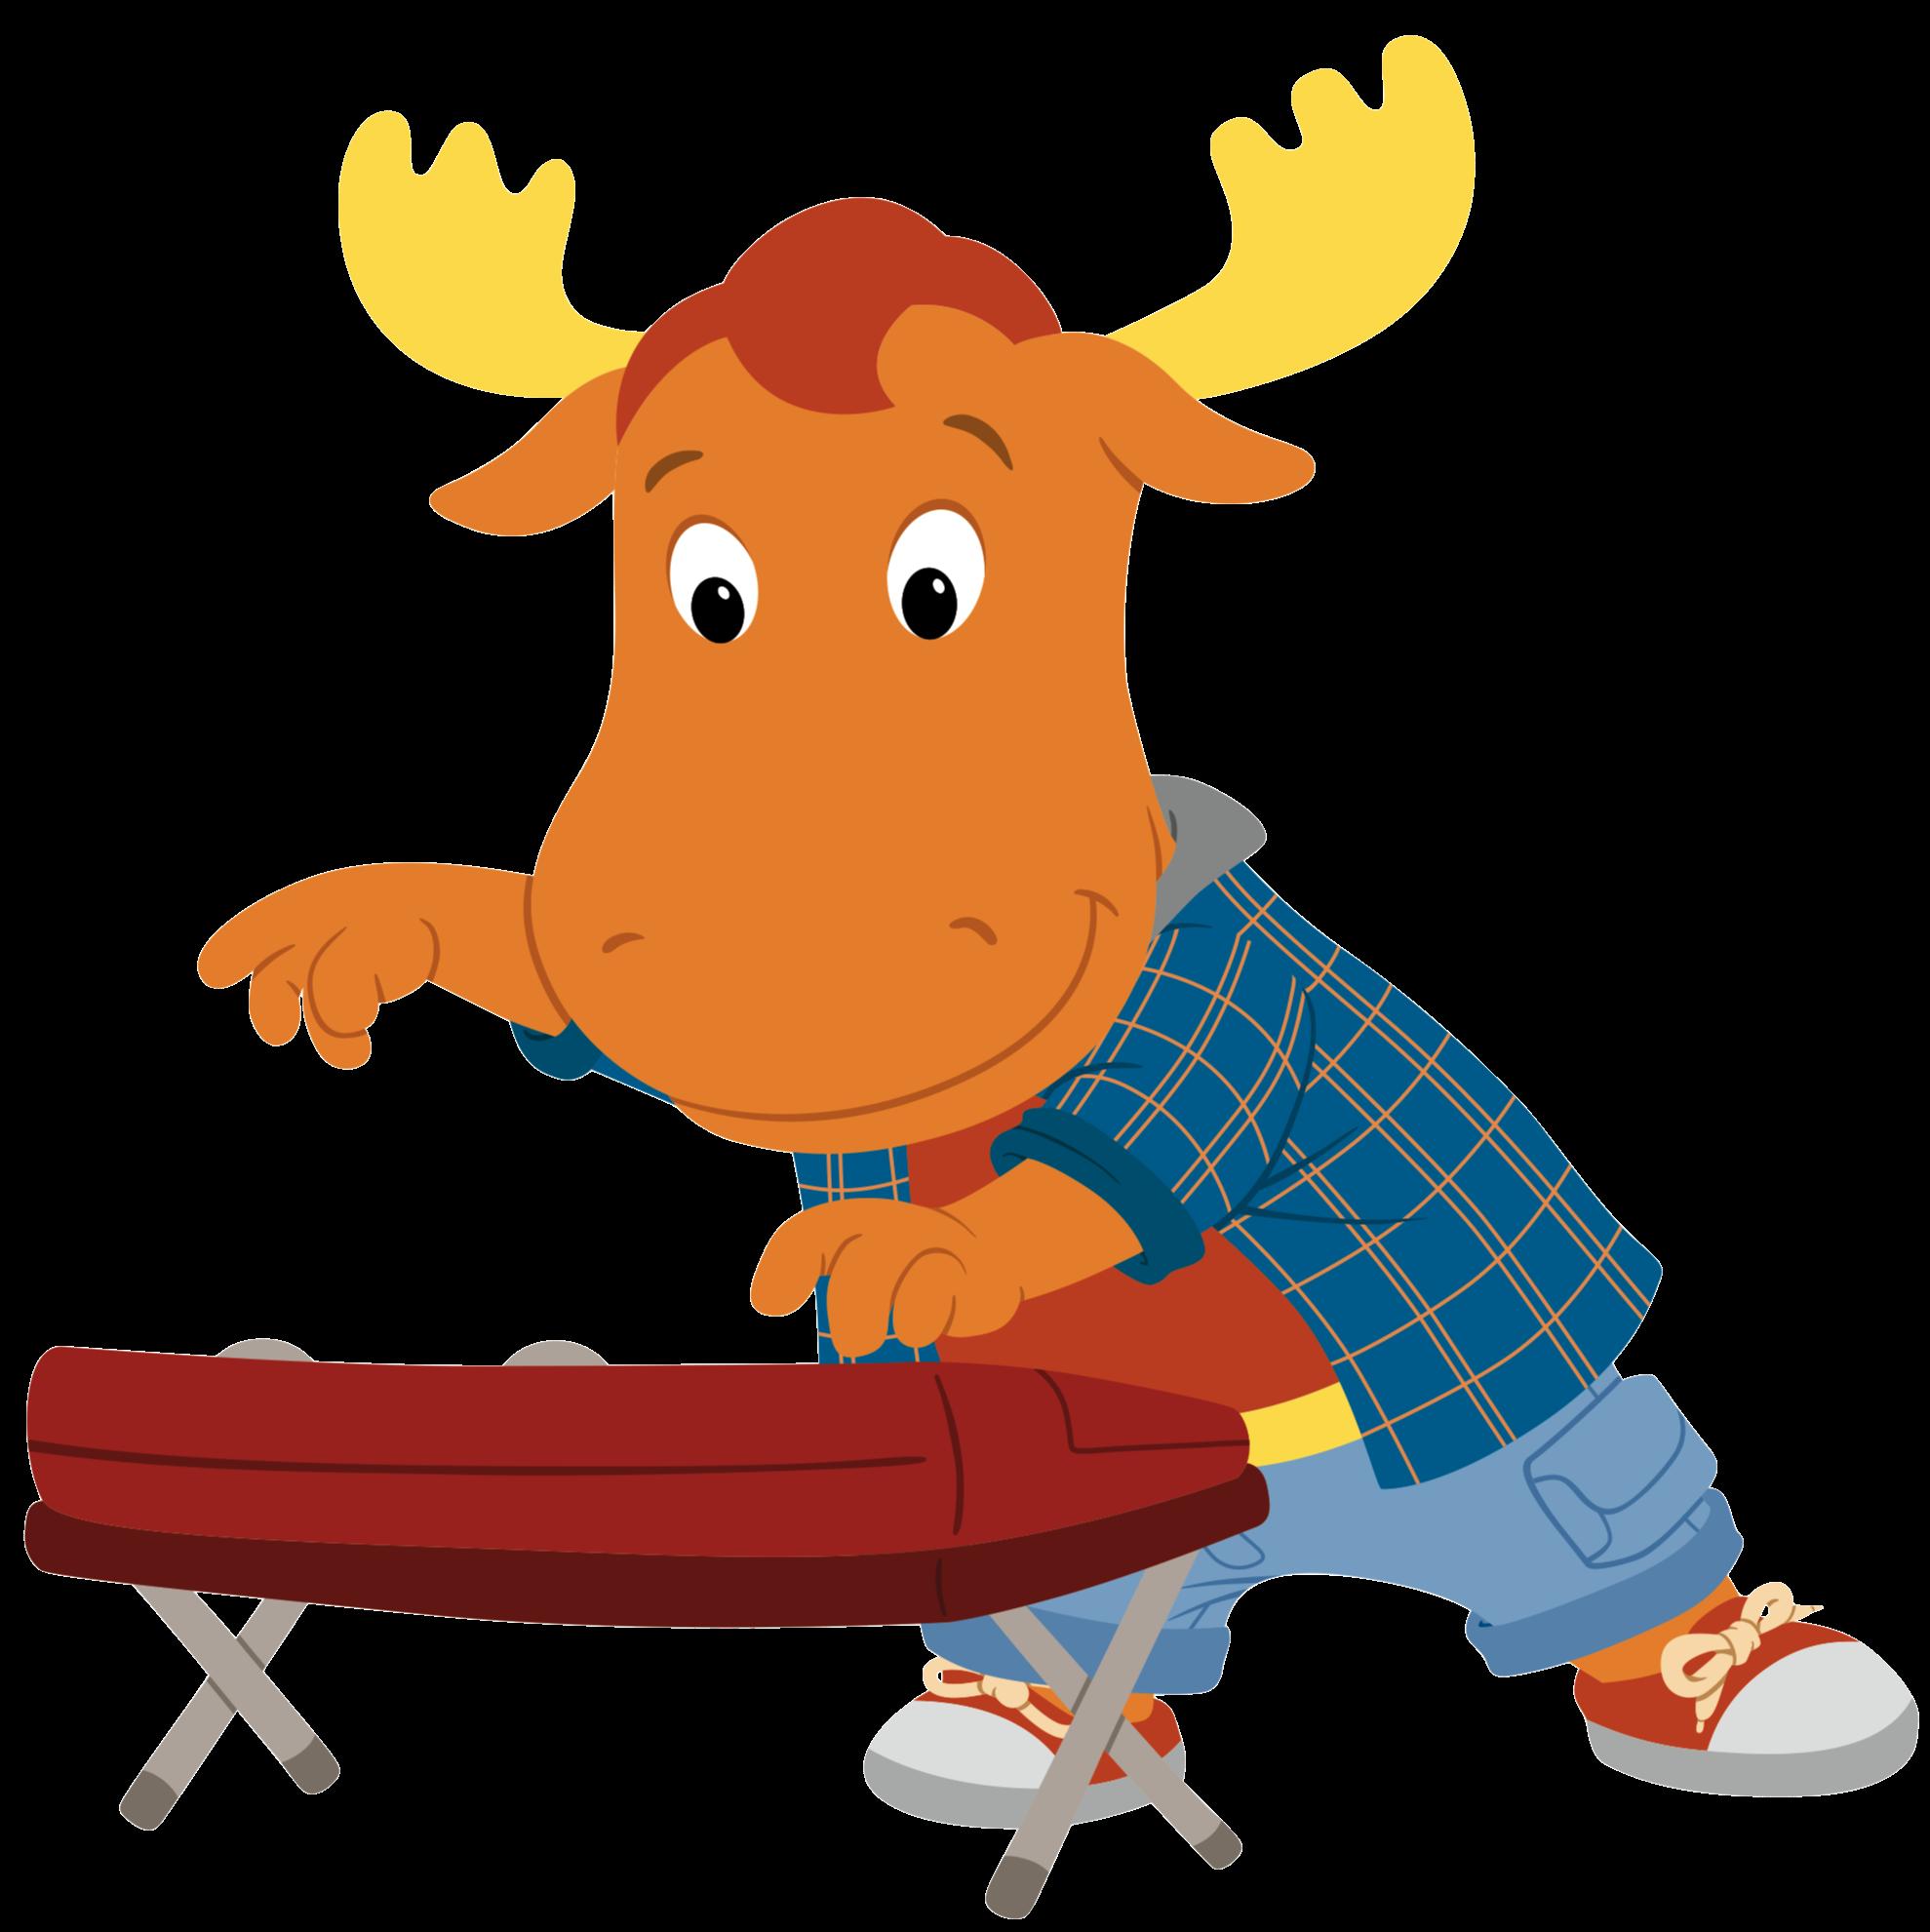 Moose clipart plaid. Keyboardist tyrone the backyardigans